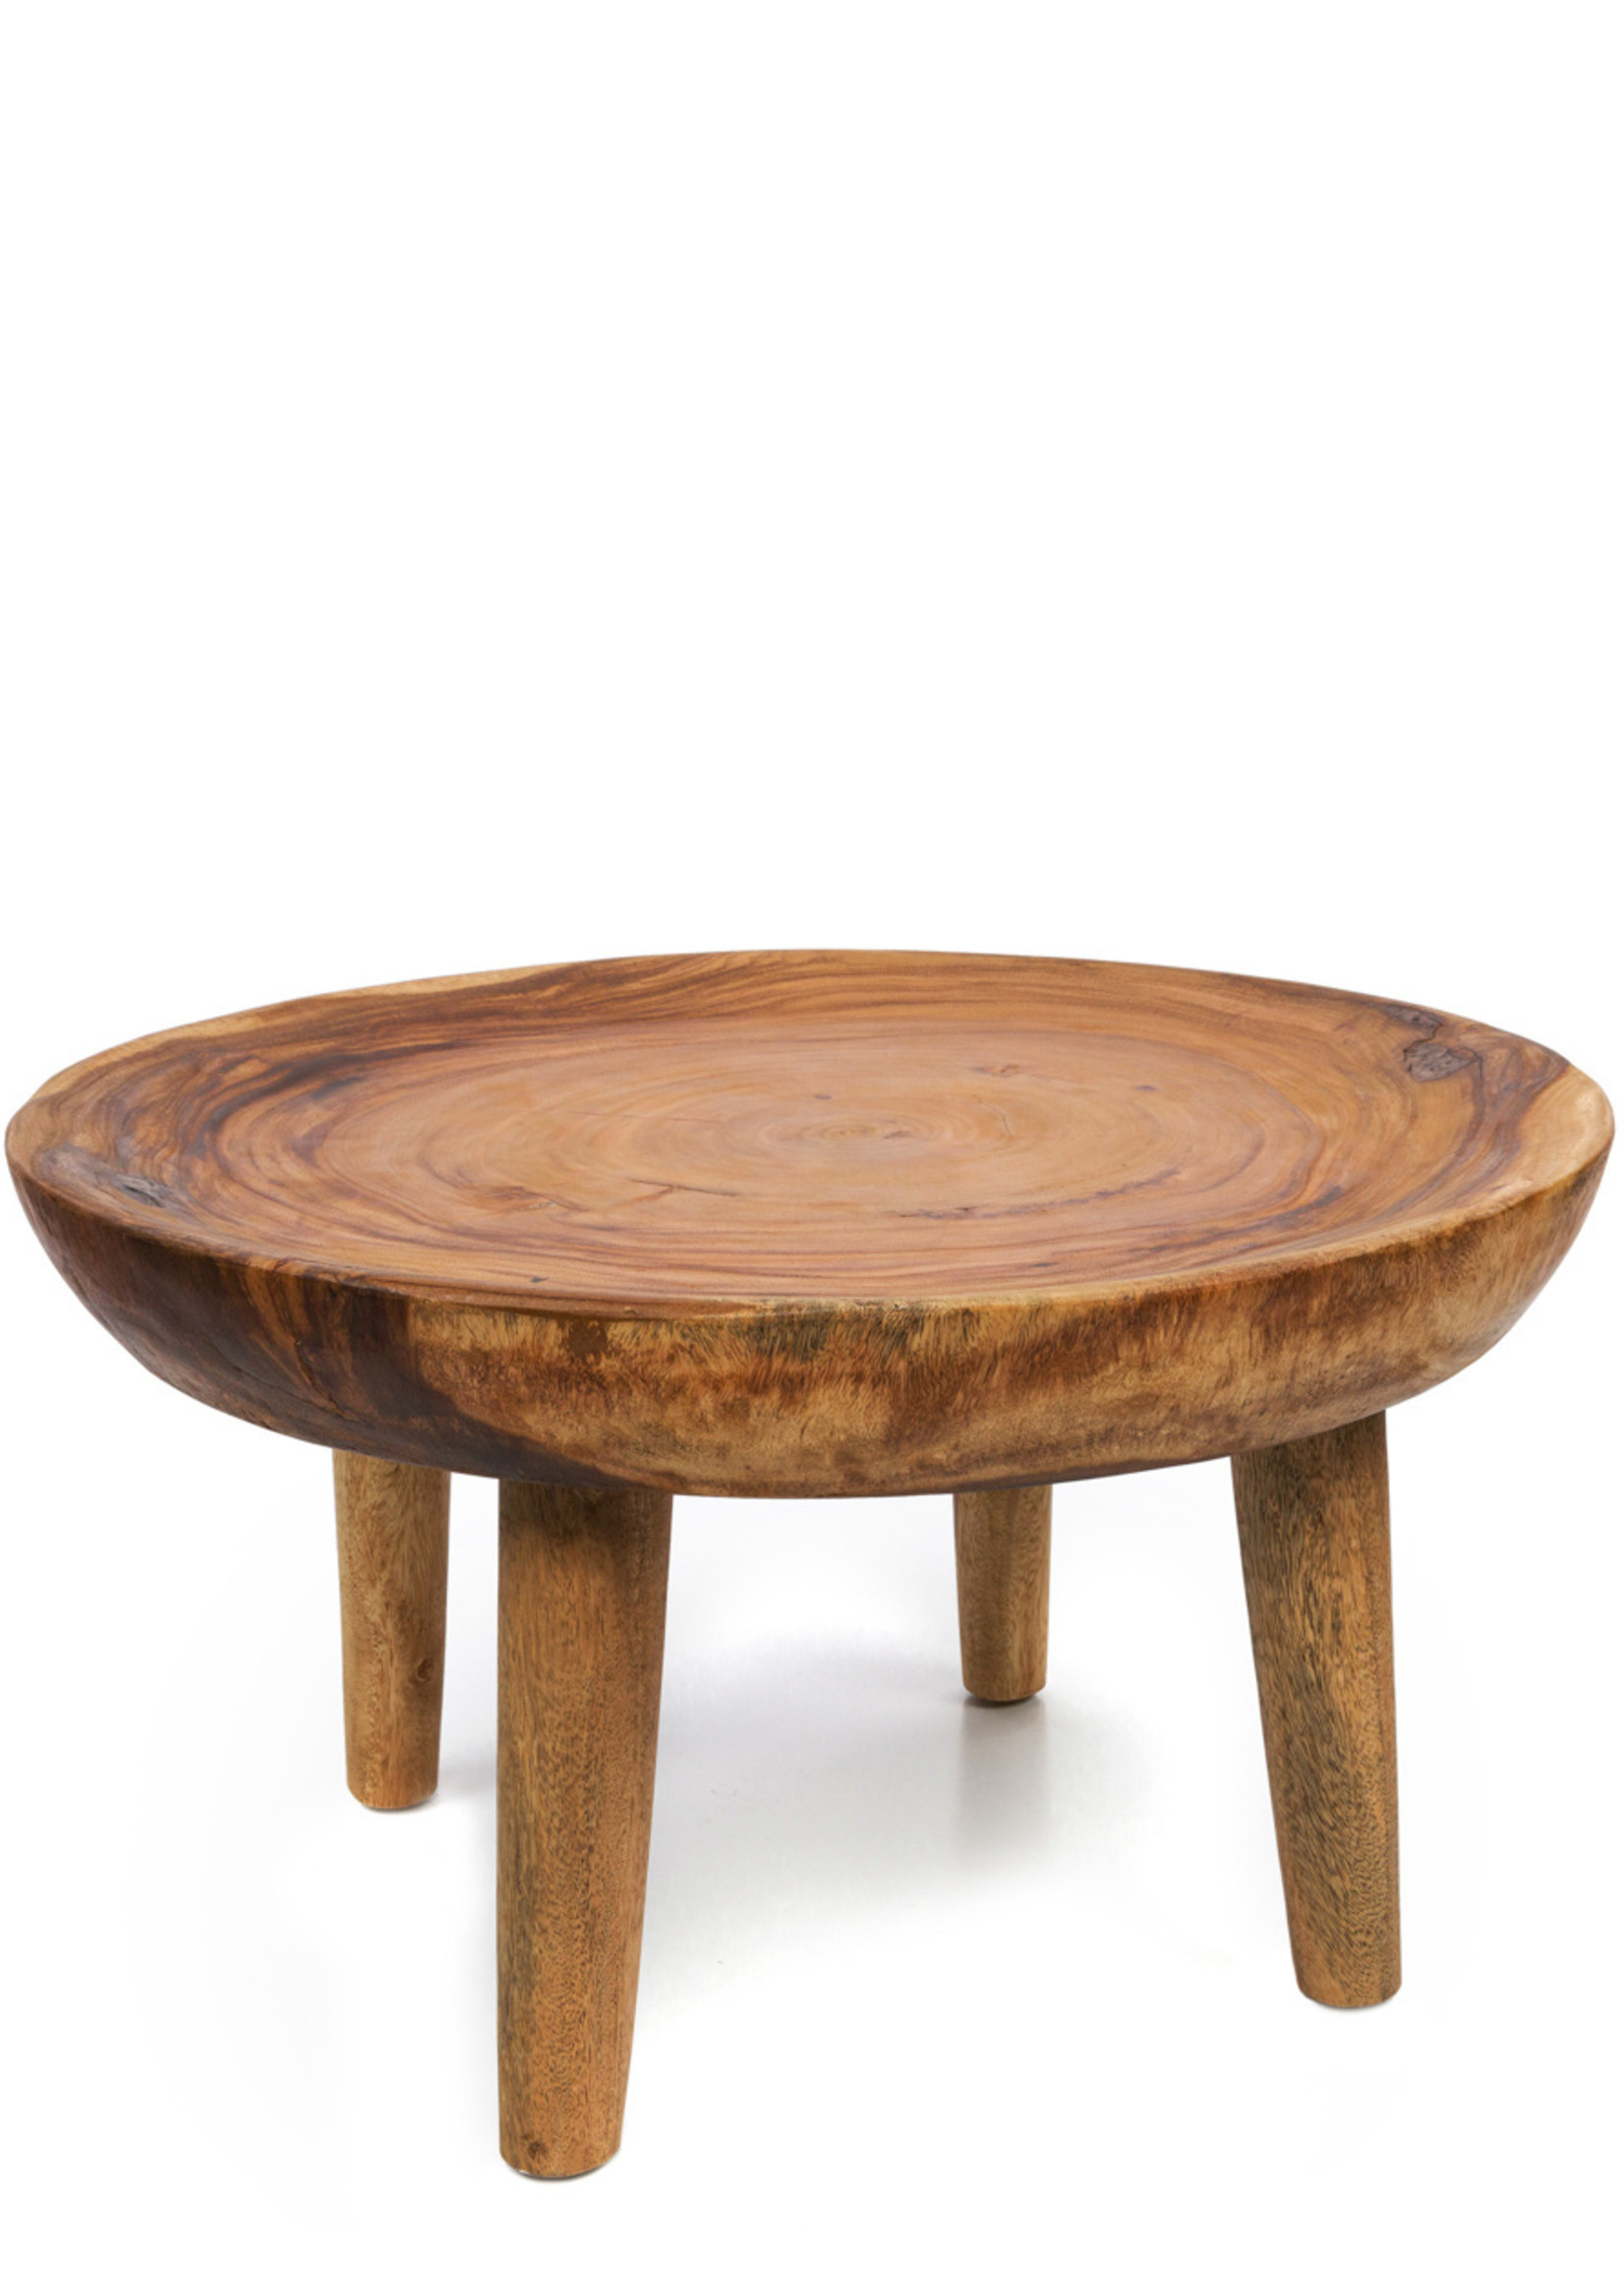 The Munggur Coffee table - Natural